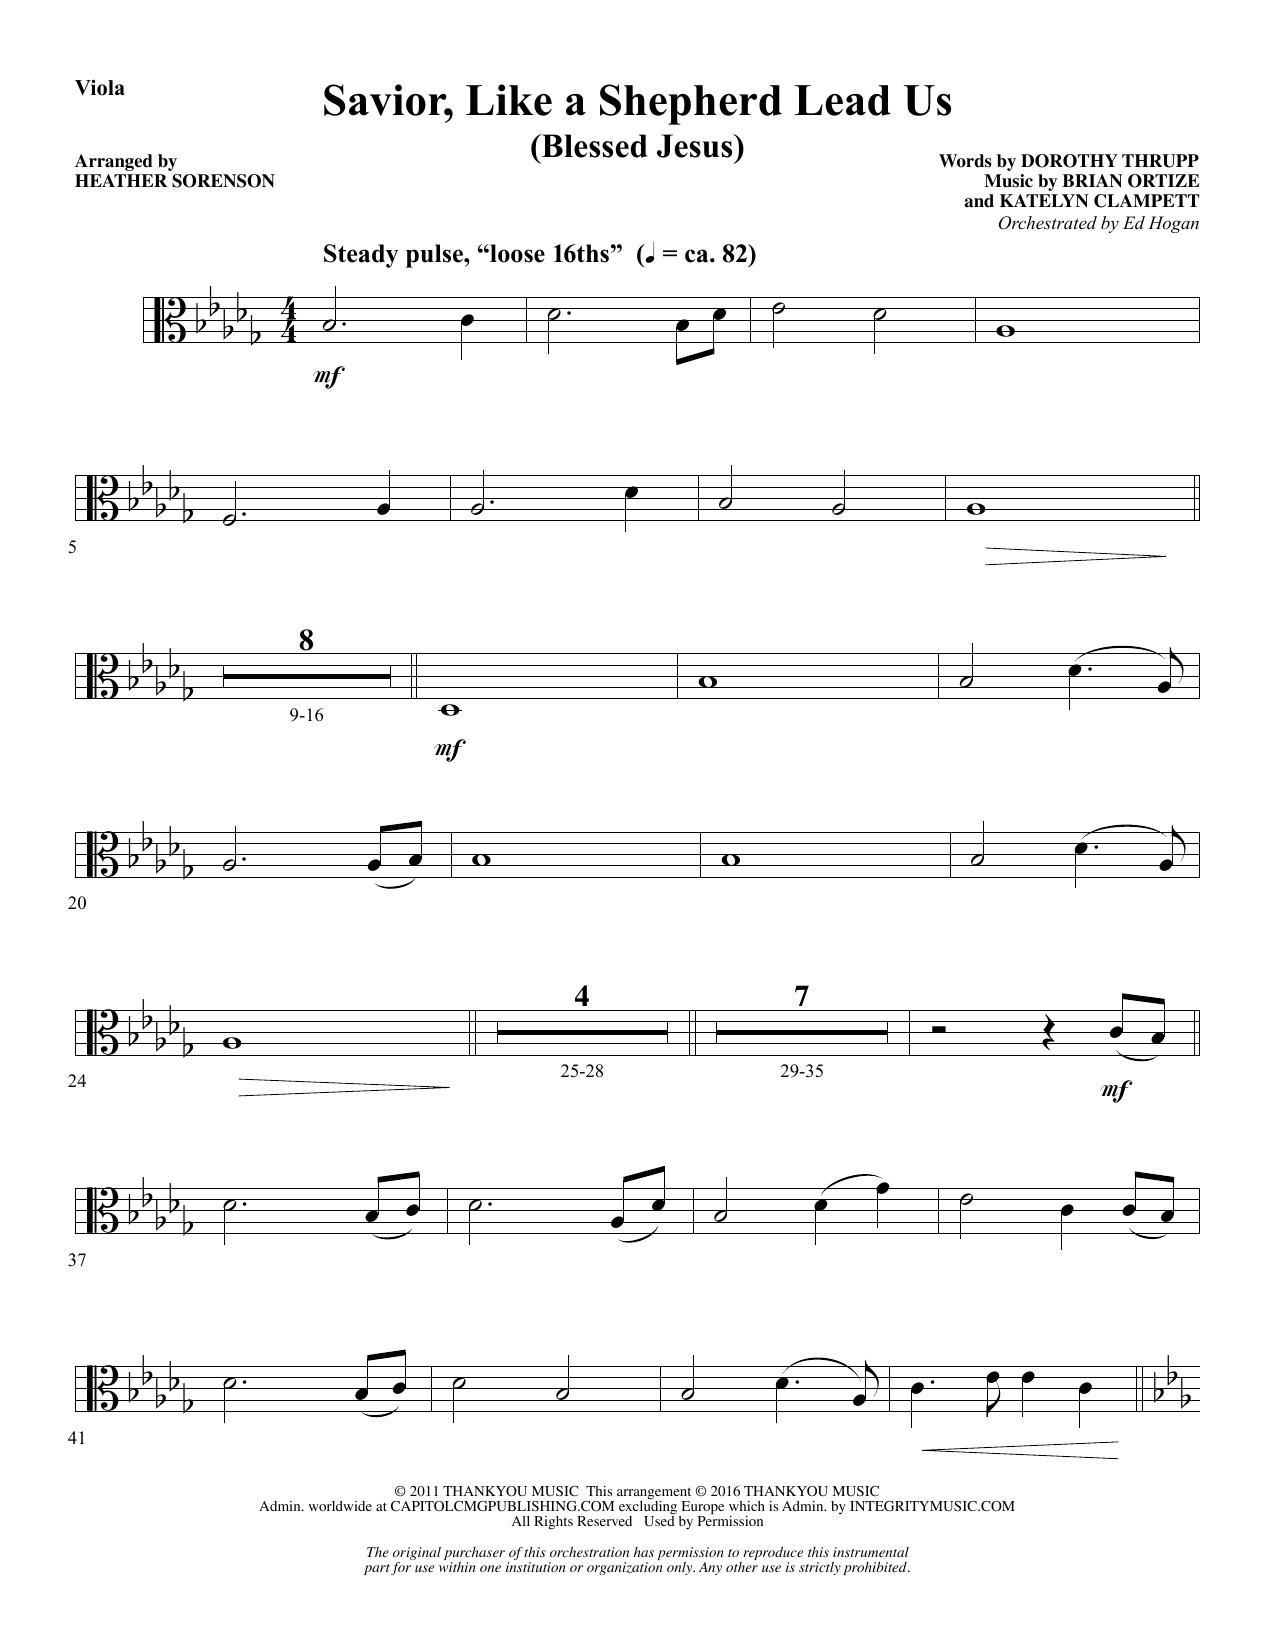 Savior, Like a Shepherd Lead Us (Blessed Jesus) - Viola Sheet Music